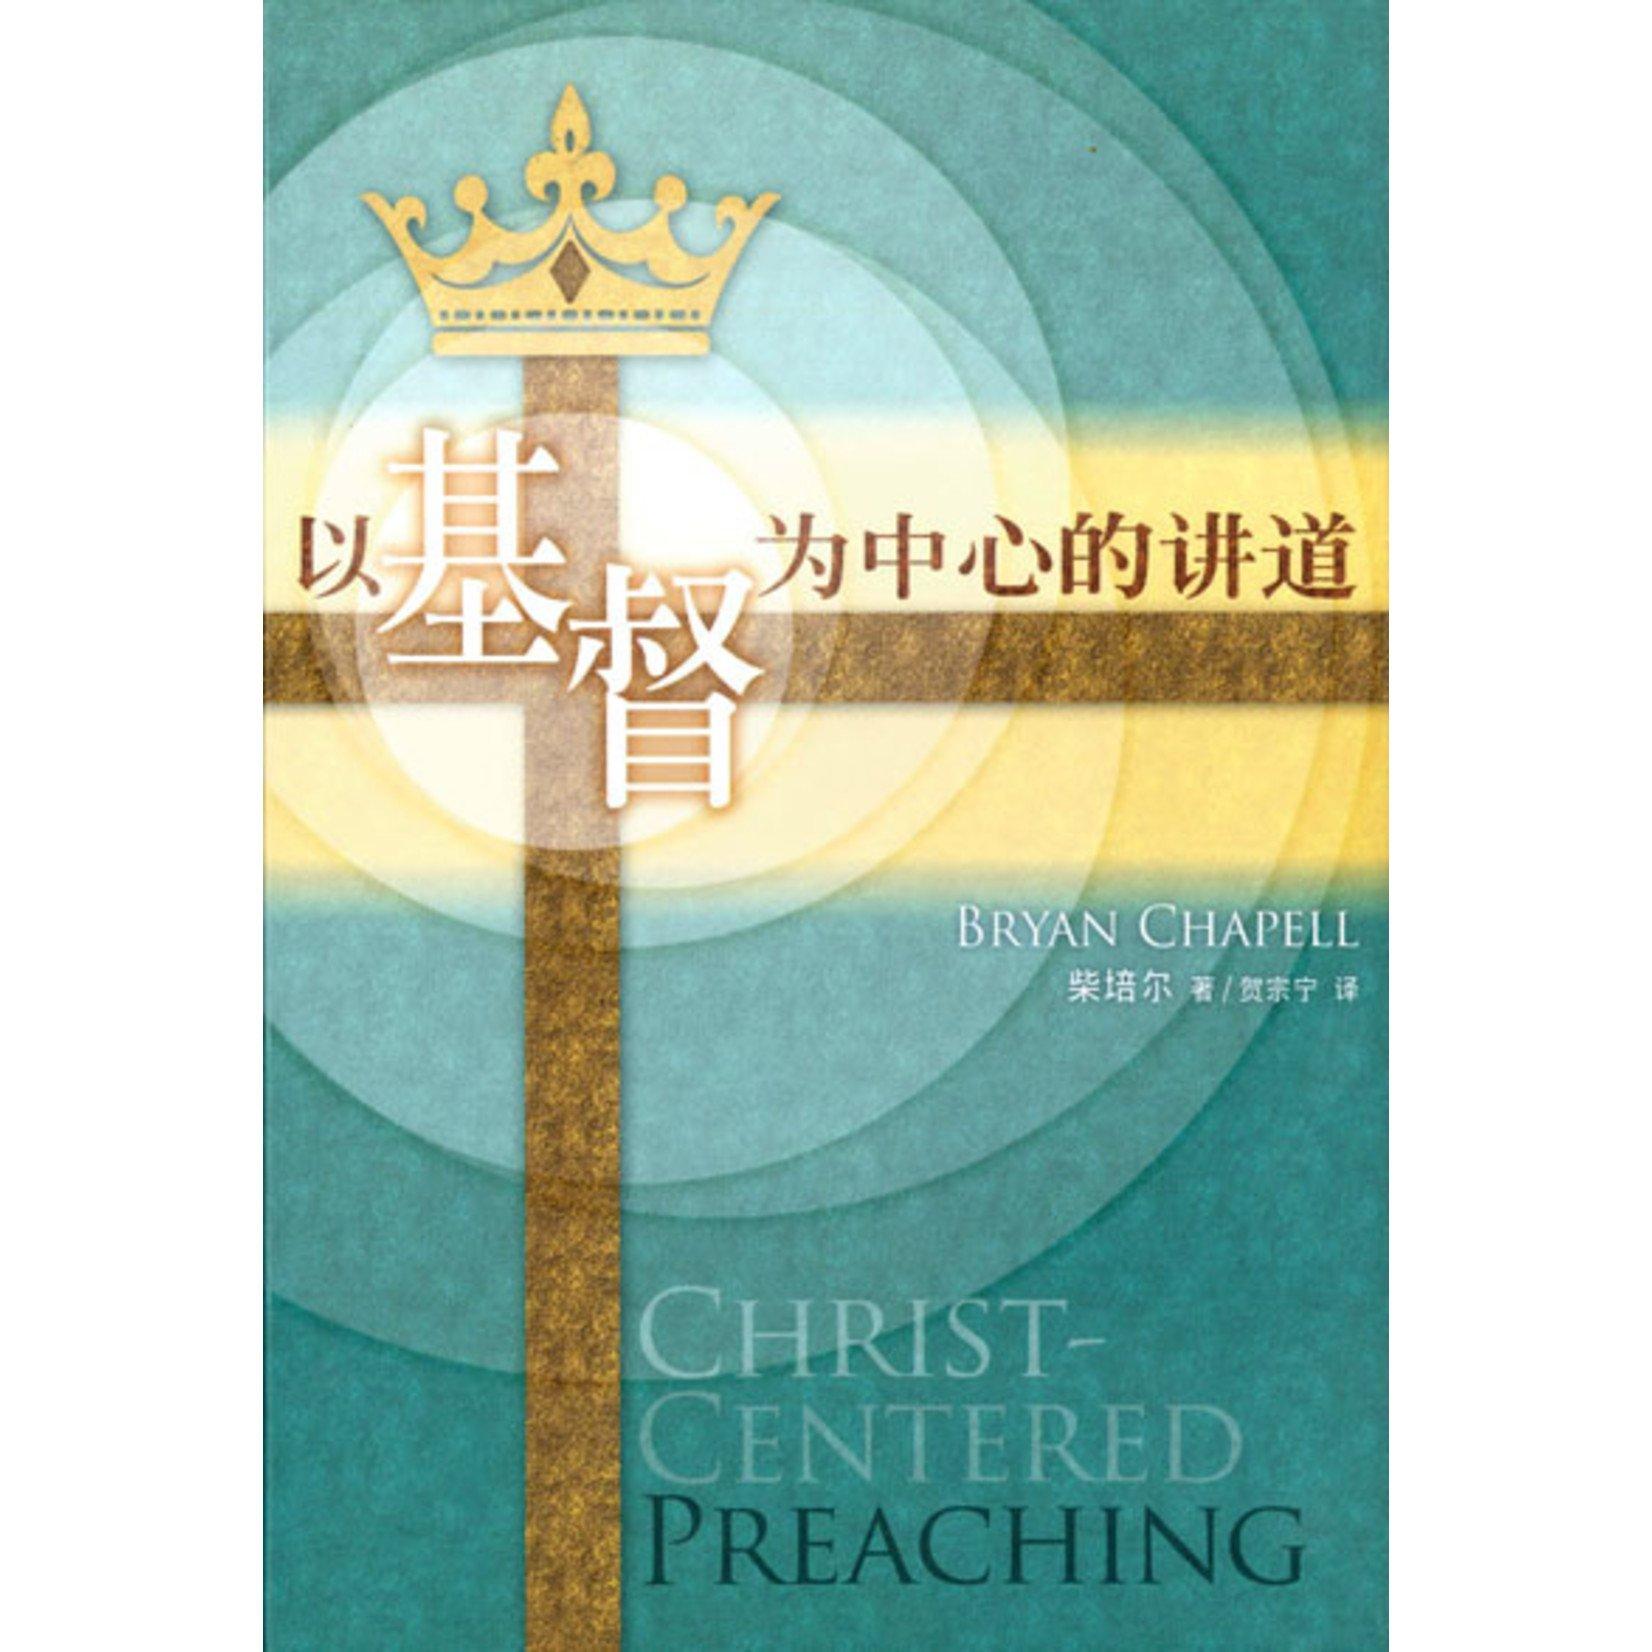 更新傳道會 Christian Renewal Ministries 以基督為中心的講道(簡體) Christ-Centered Preaching